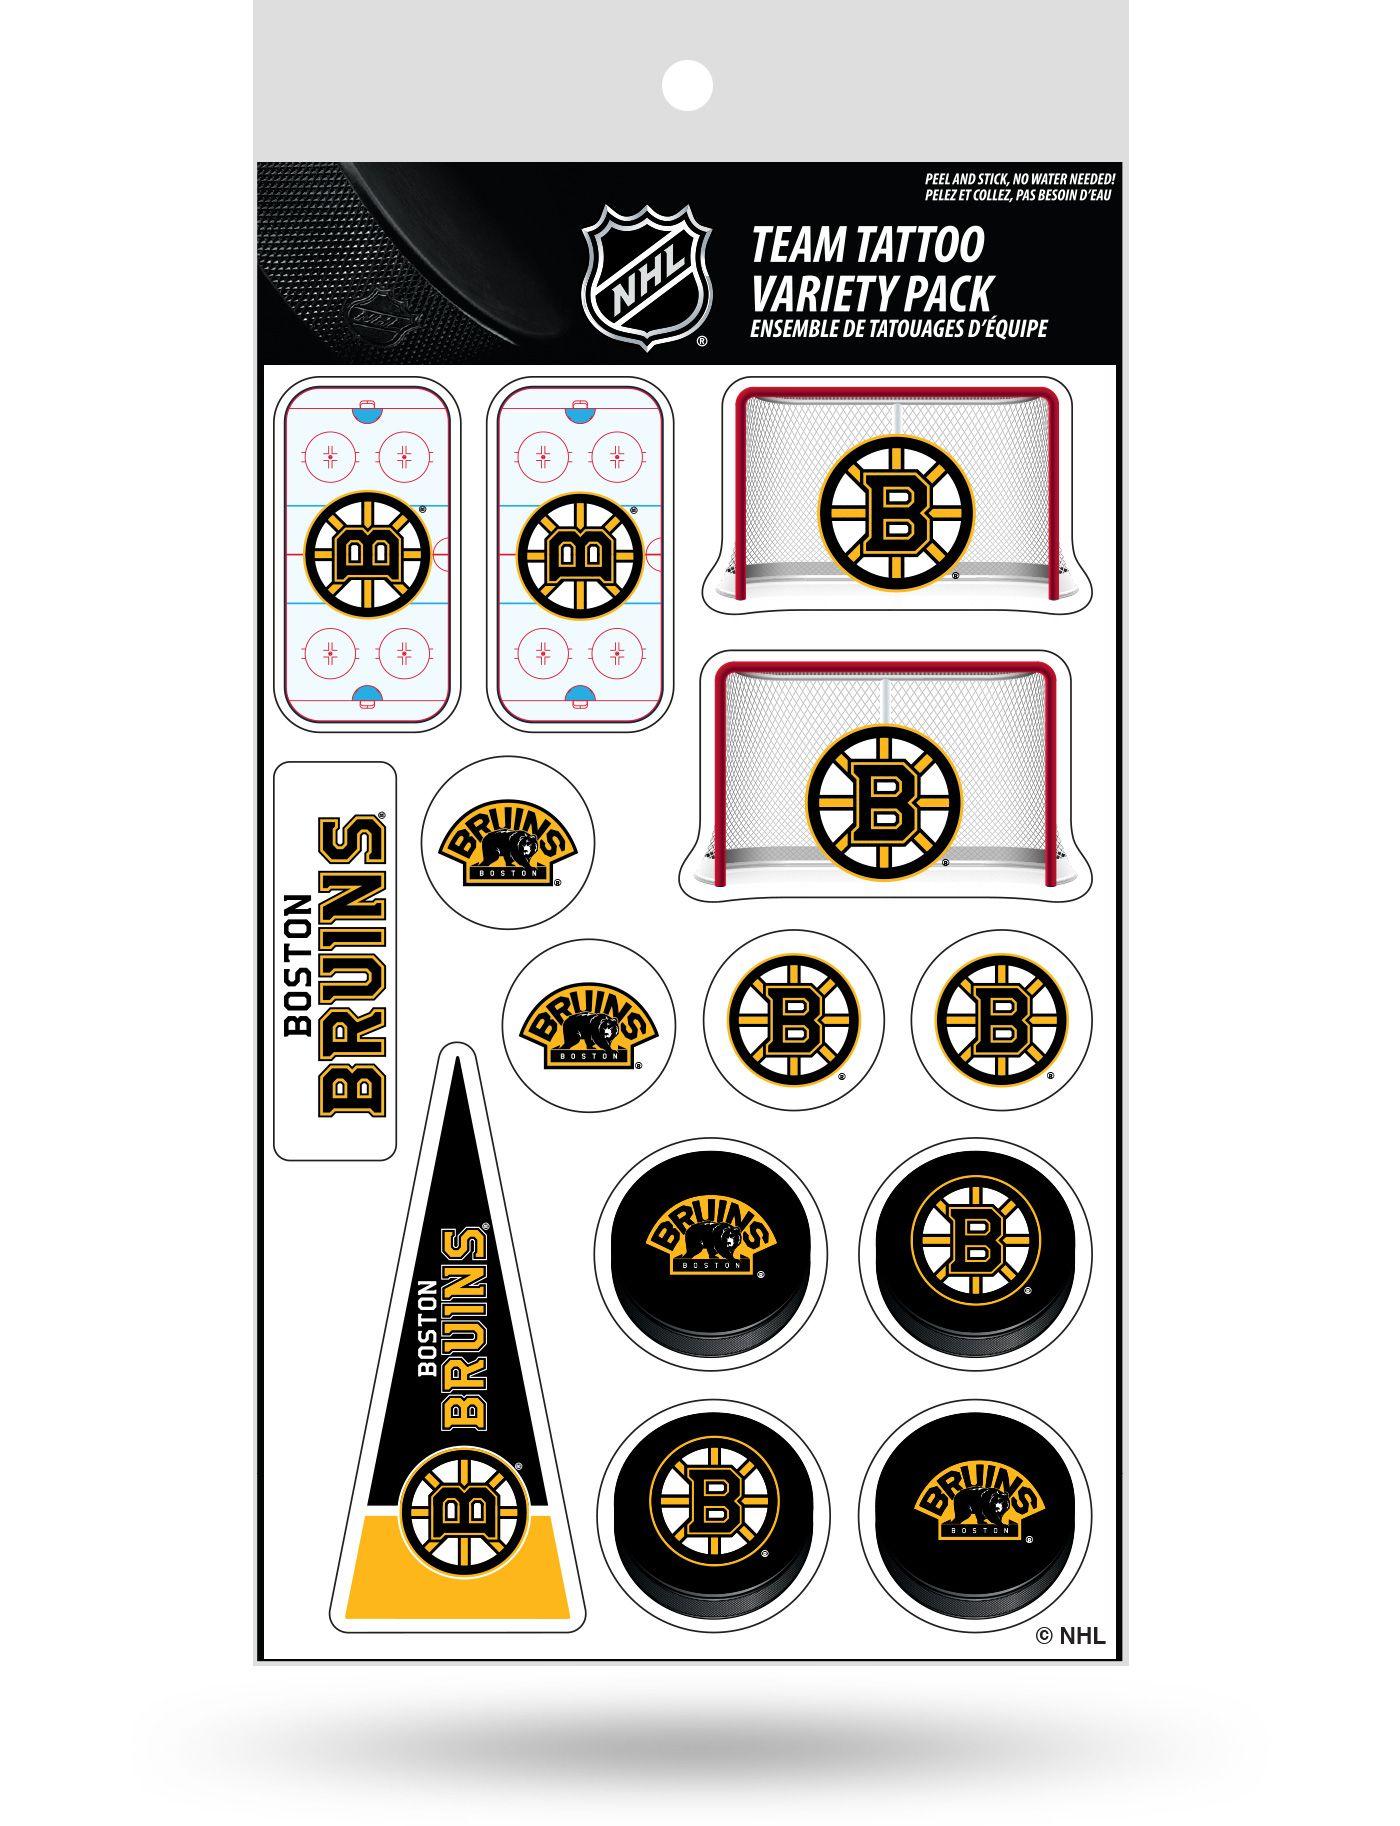 Rico Boston Bruins Tattoo Variety Pack